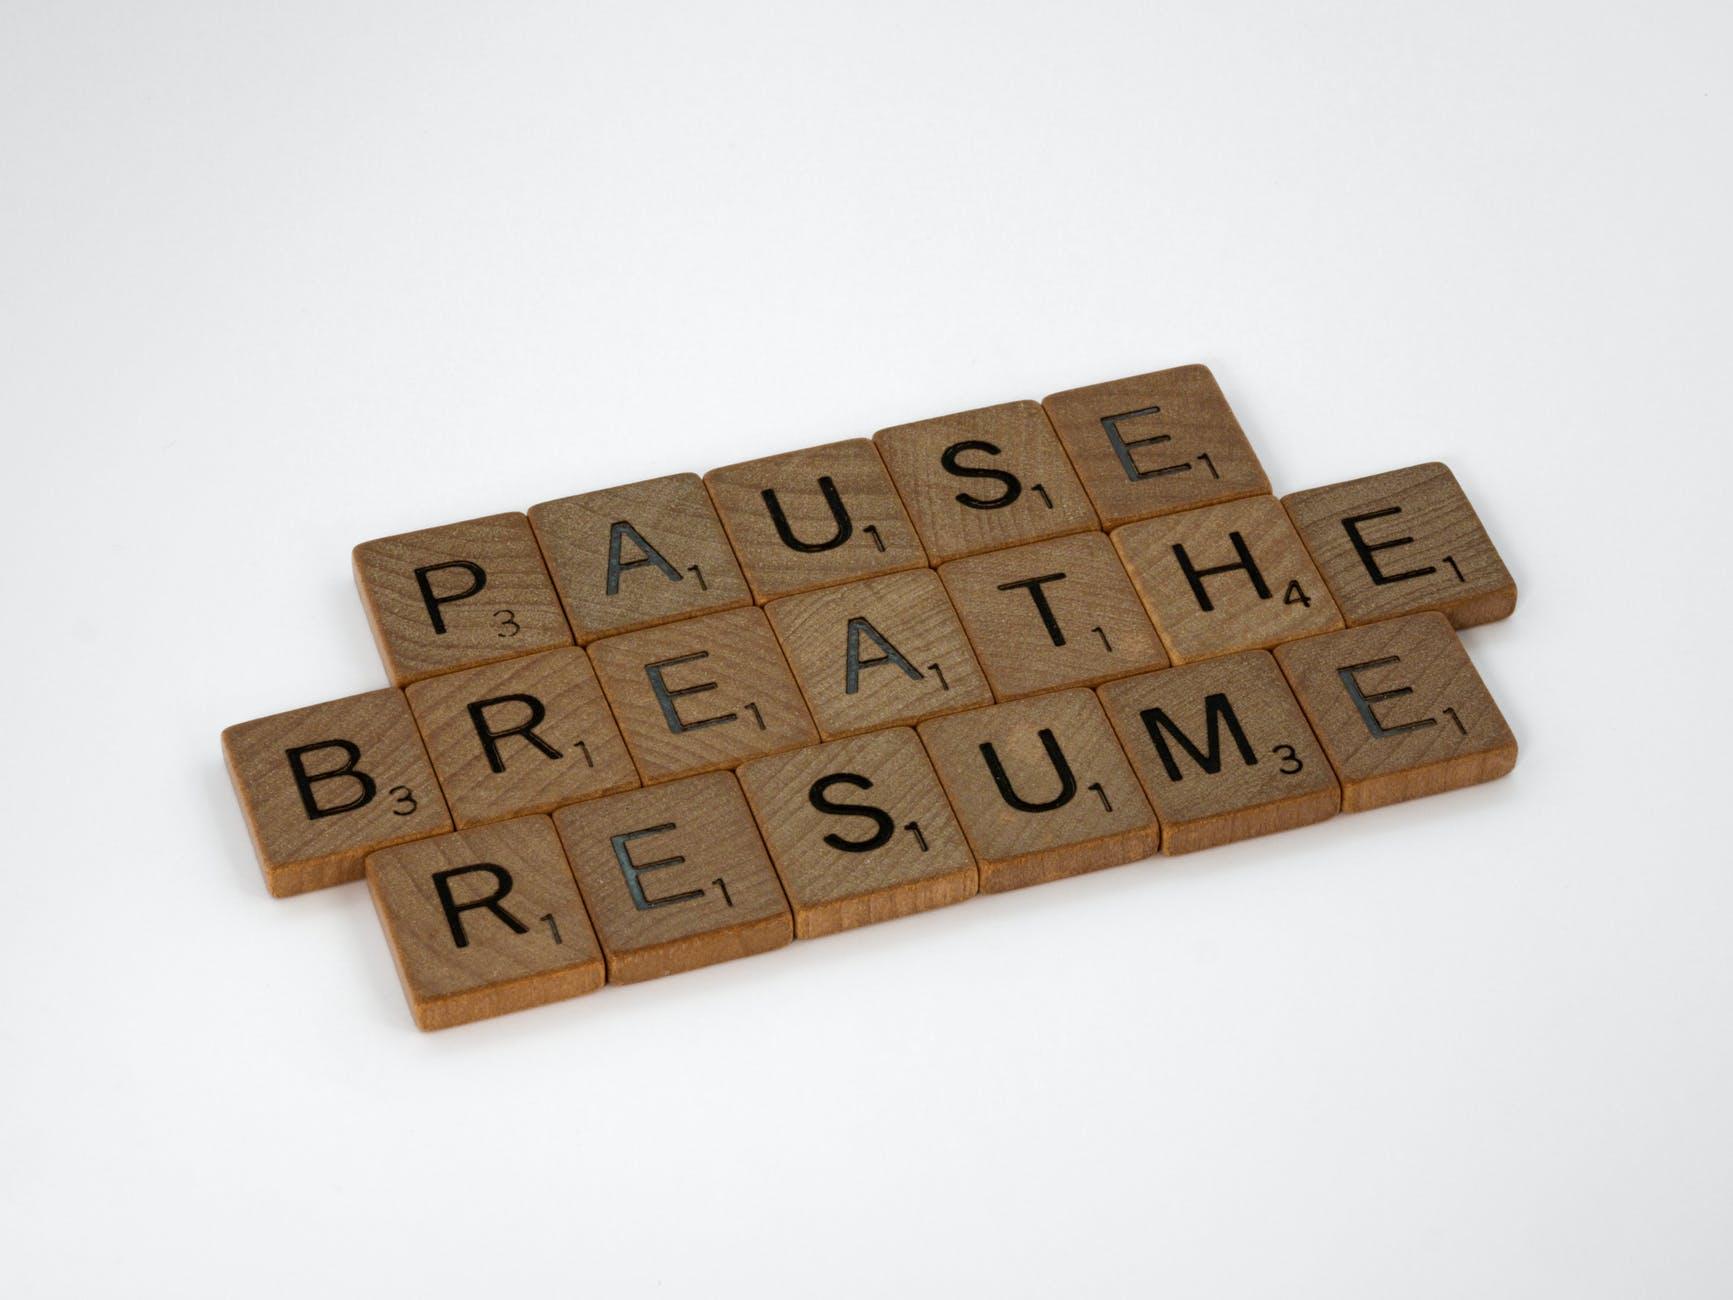 pause, breathe, resume tiles